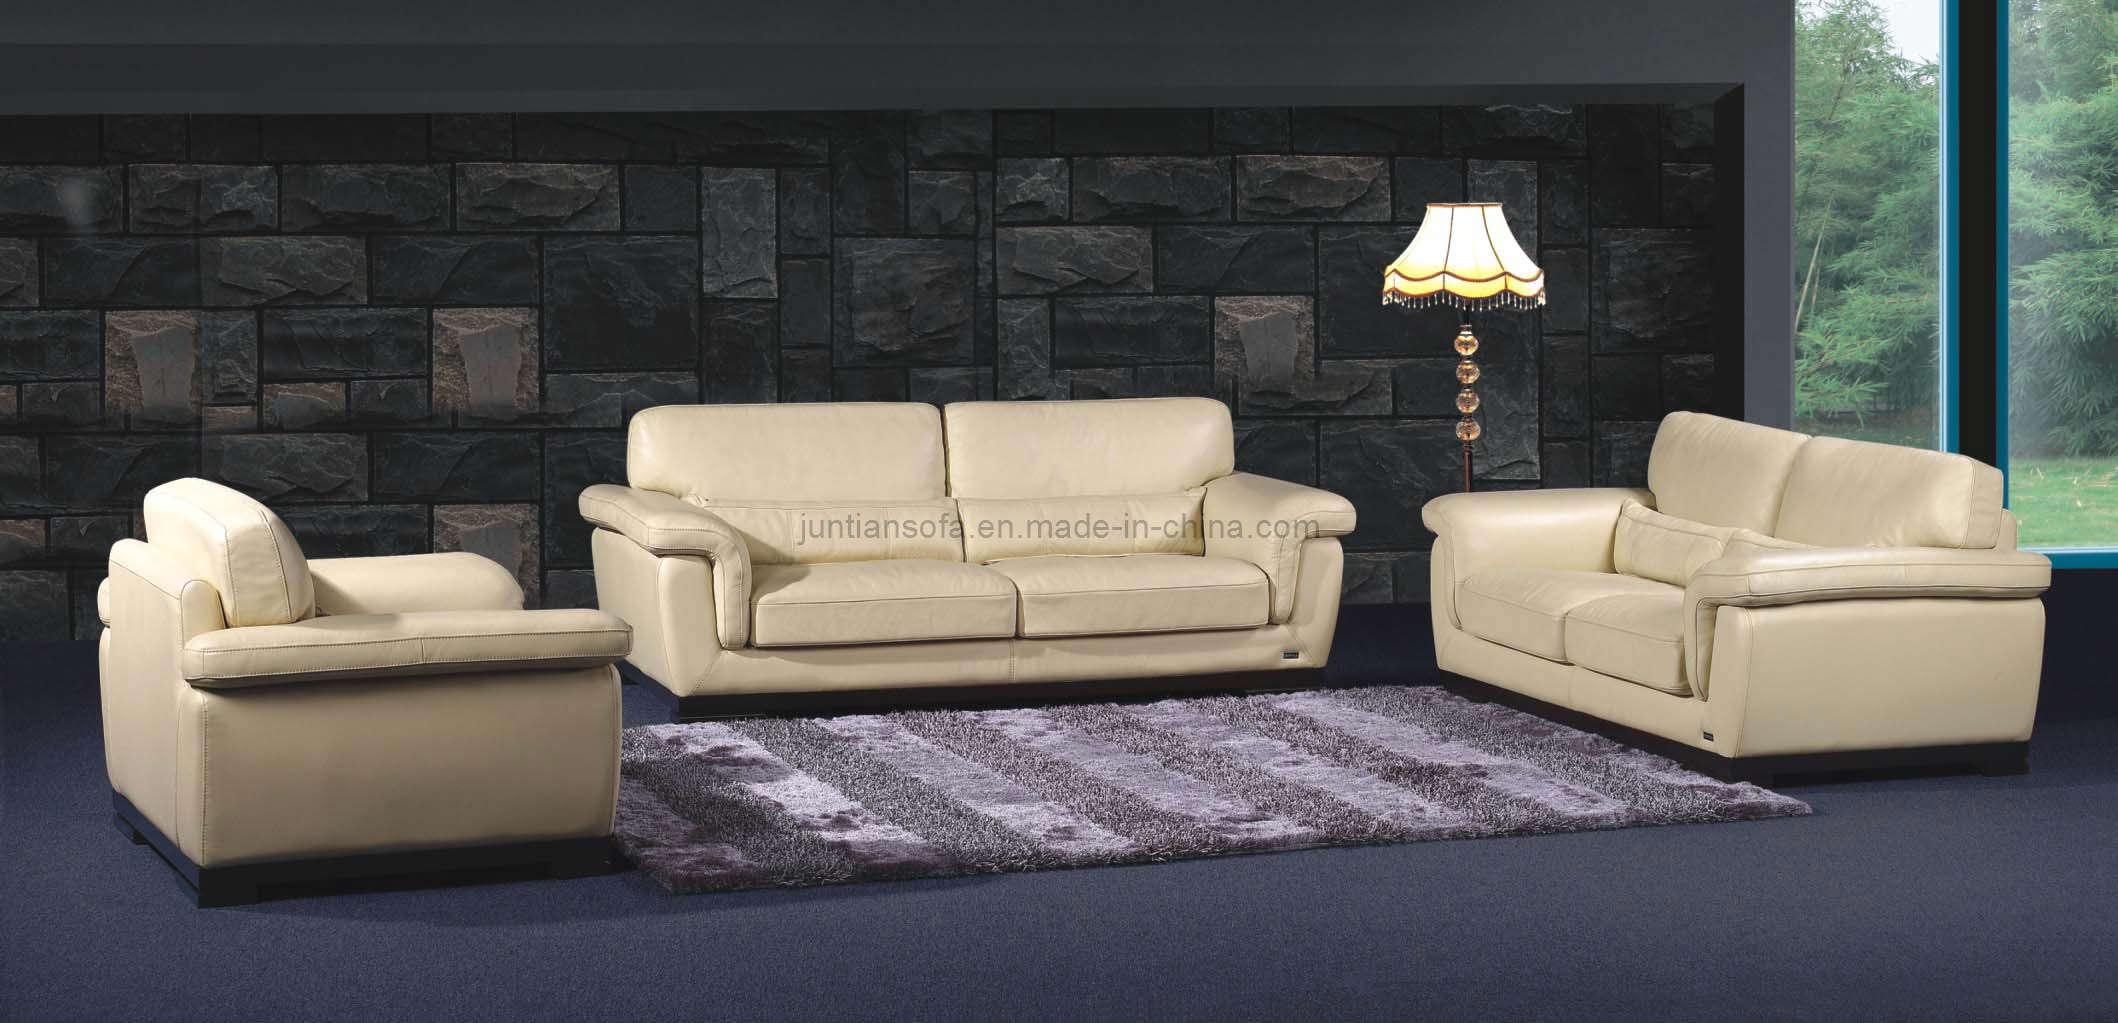 high quality sofa lovely high quality sectional sofa 30 for sofa room ideas with high quality JVSCOKR